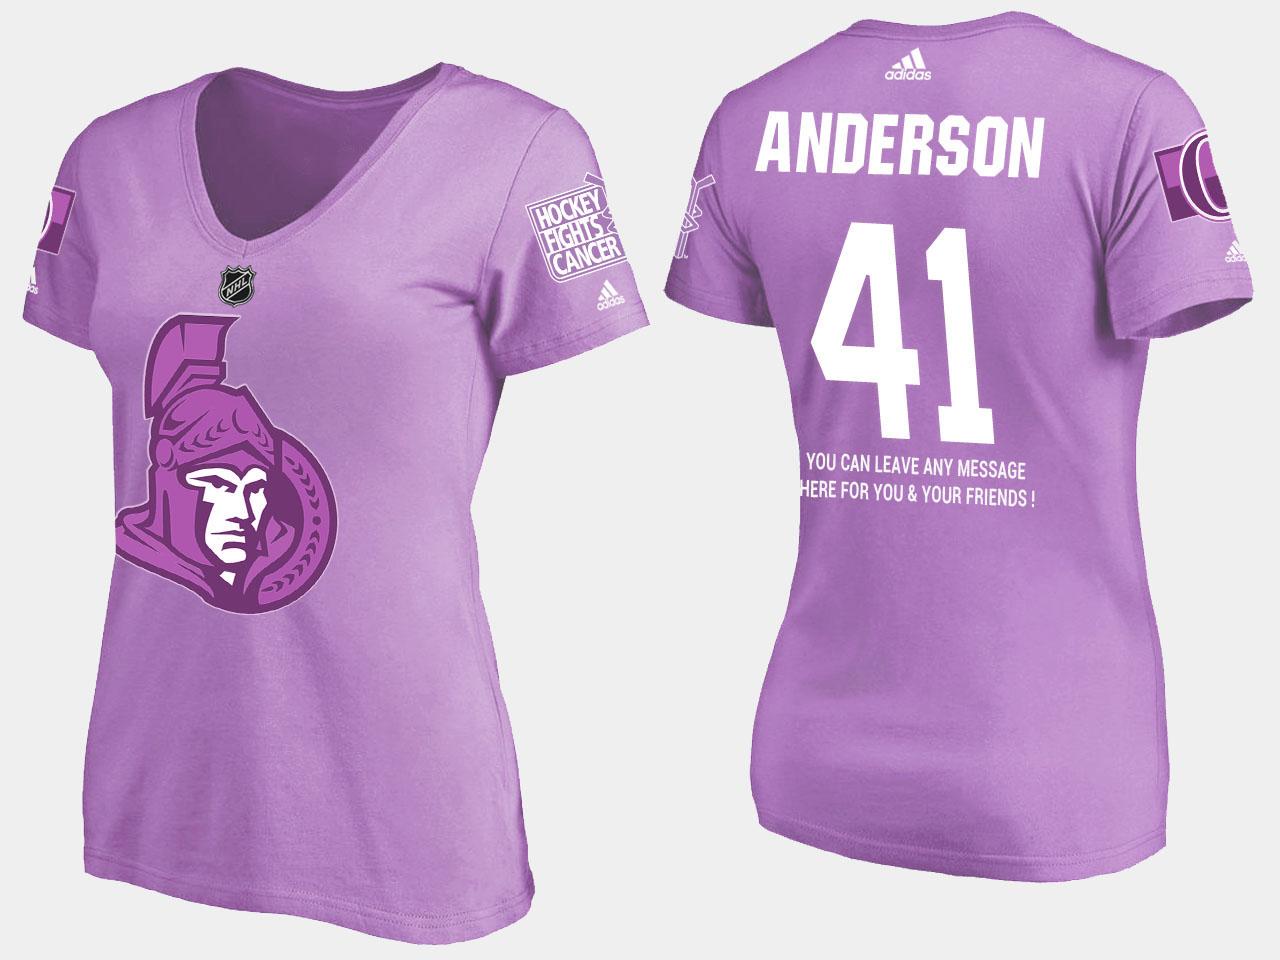 Women's Craig Anderson Ottawa Senators Purple T-Shirt Fights Cancer